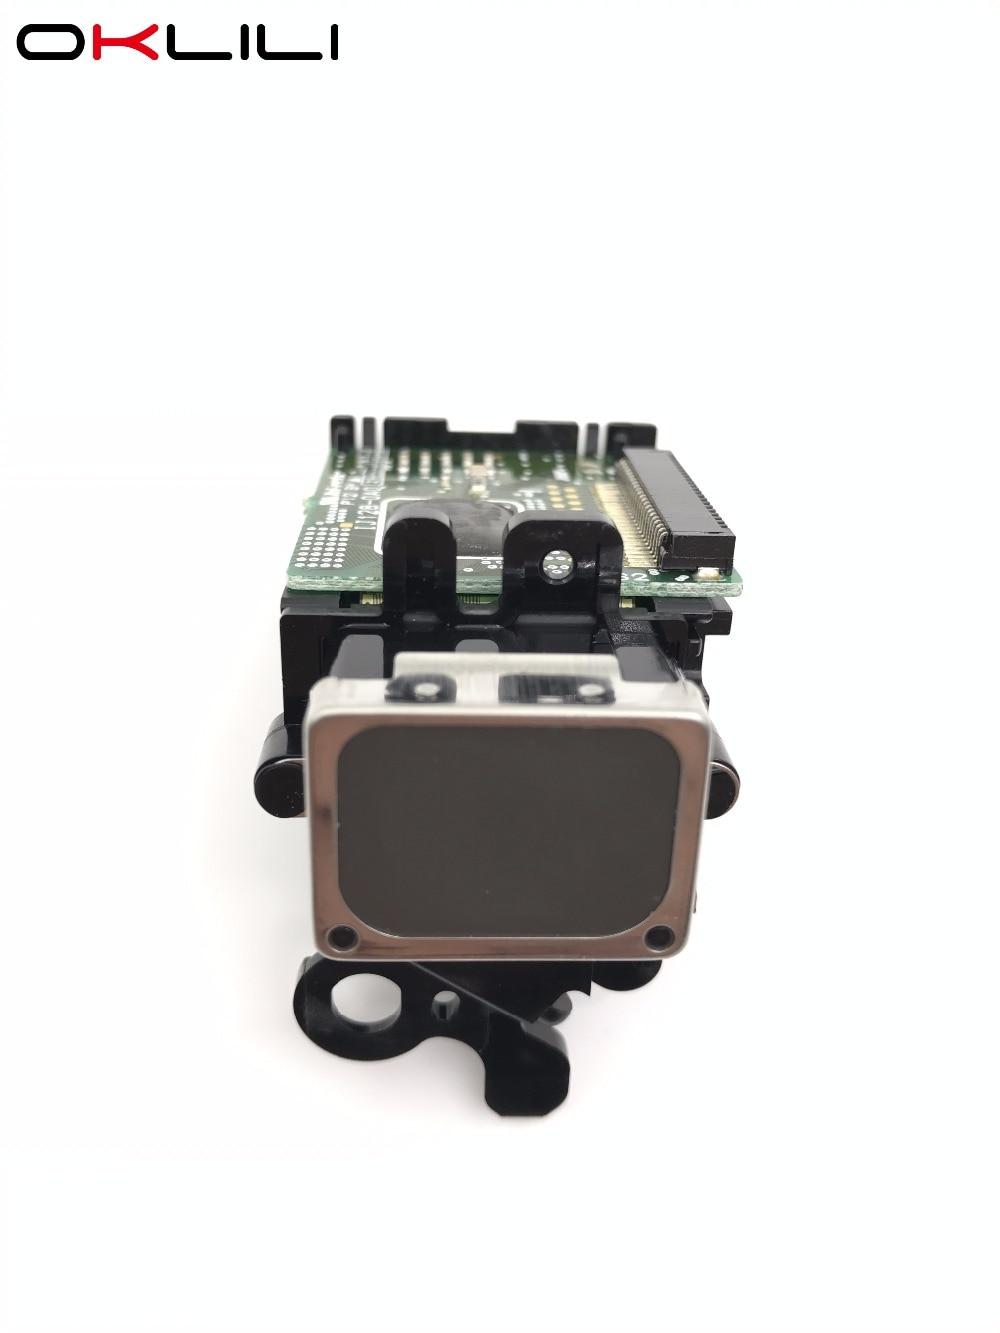 F056030 F056010 BLACK Printhead Printer Print Head for Epson DX2 Color 1520 1520K 3000 800 800N PRO 5000 7000 7500 9500 9000 простыня на резинке хлопковый край